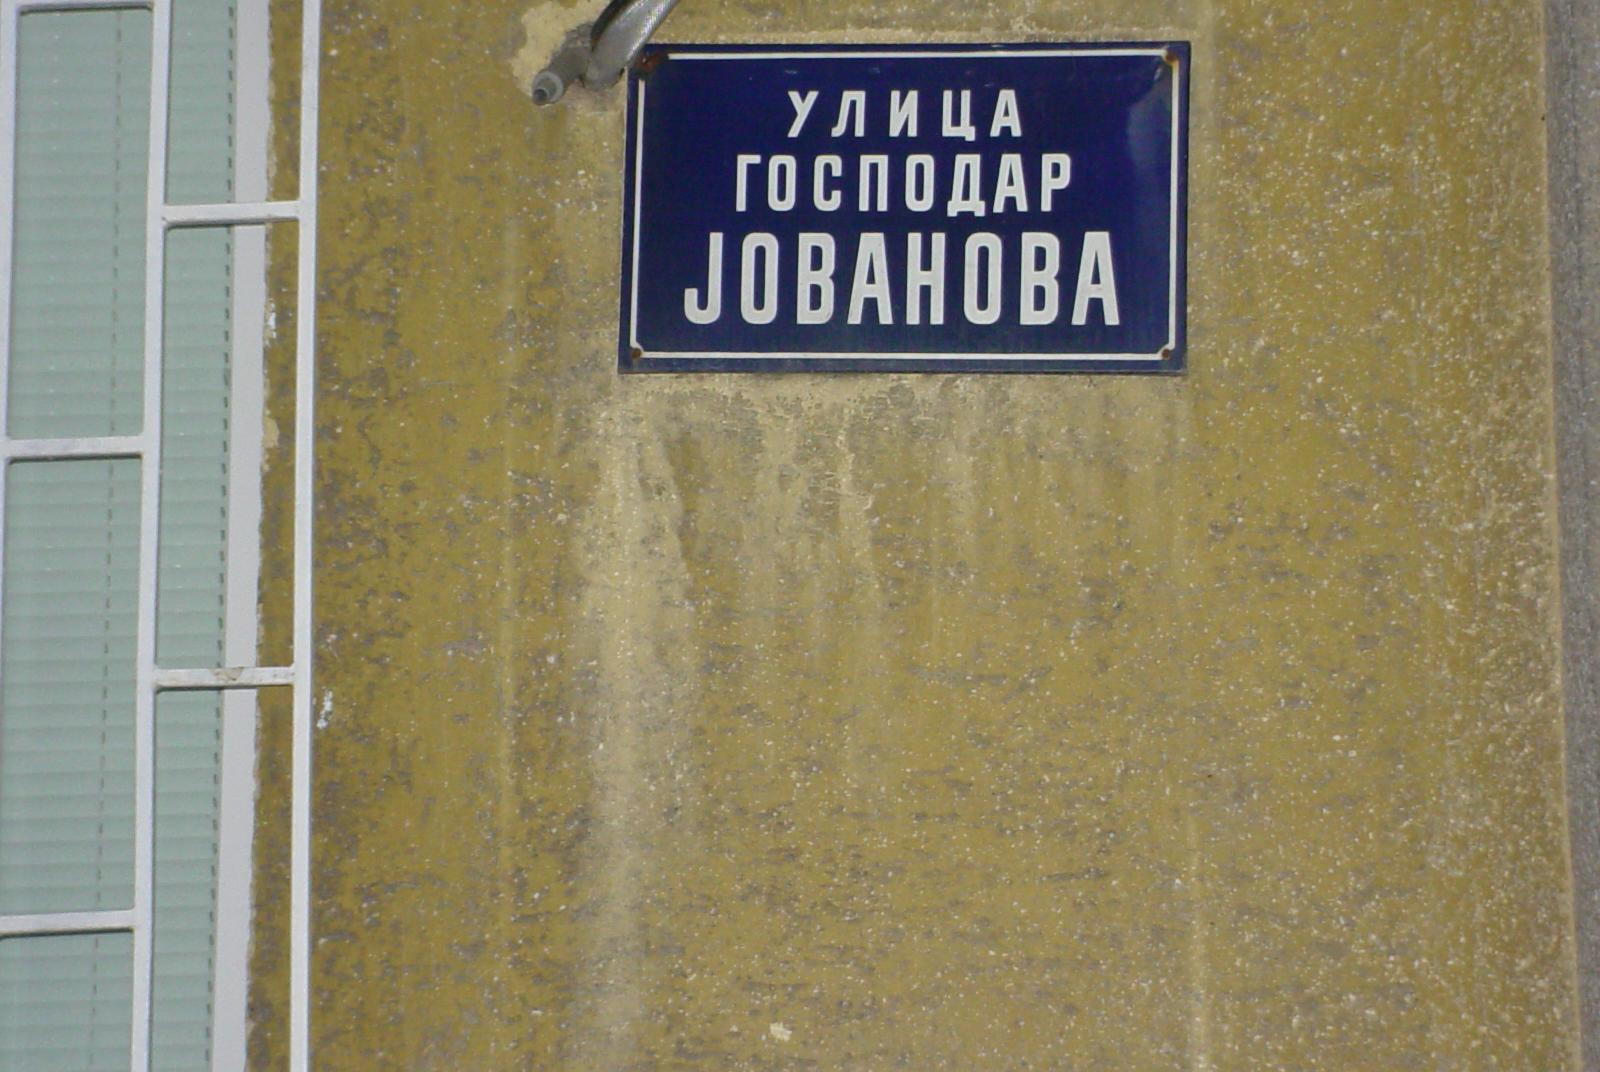 Gospodar Jovanova Street sign